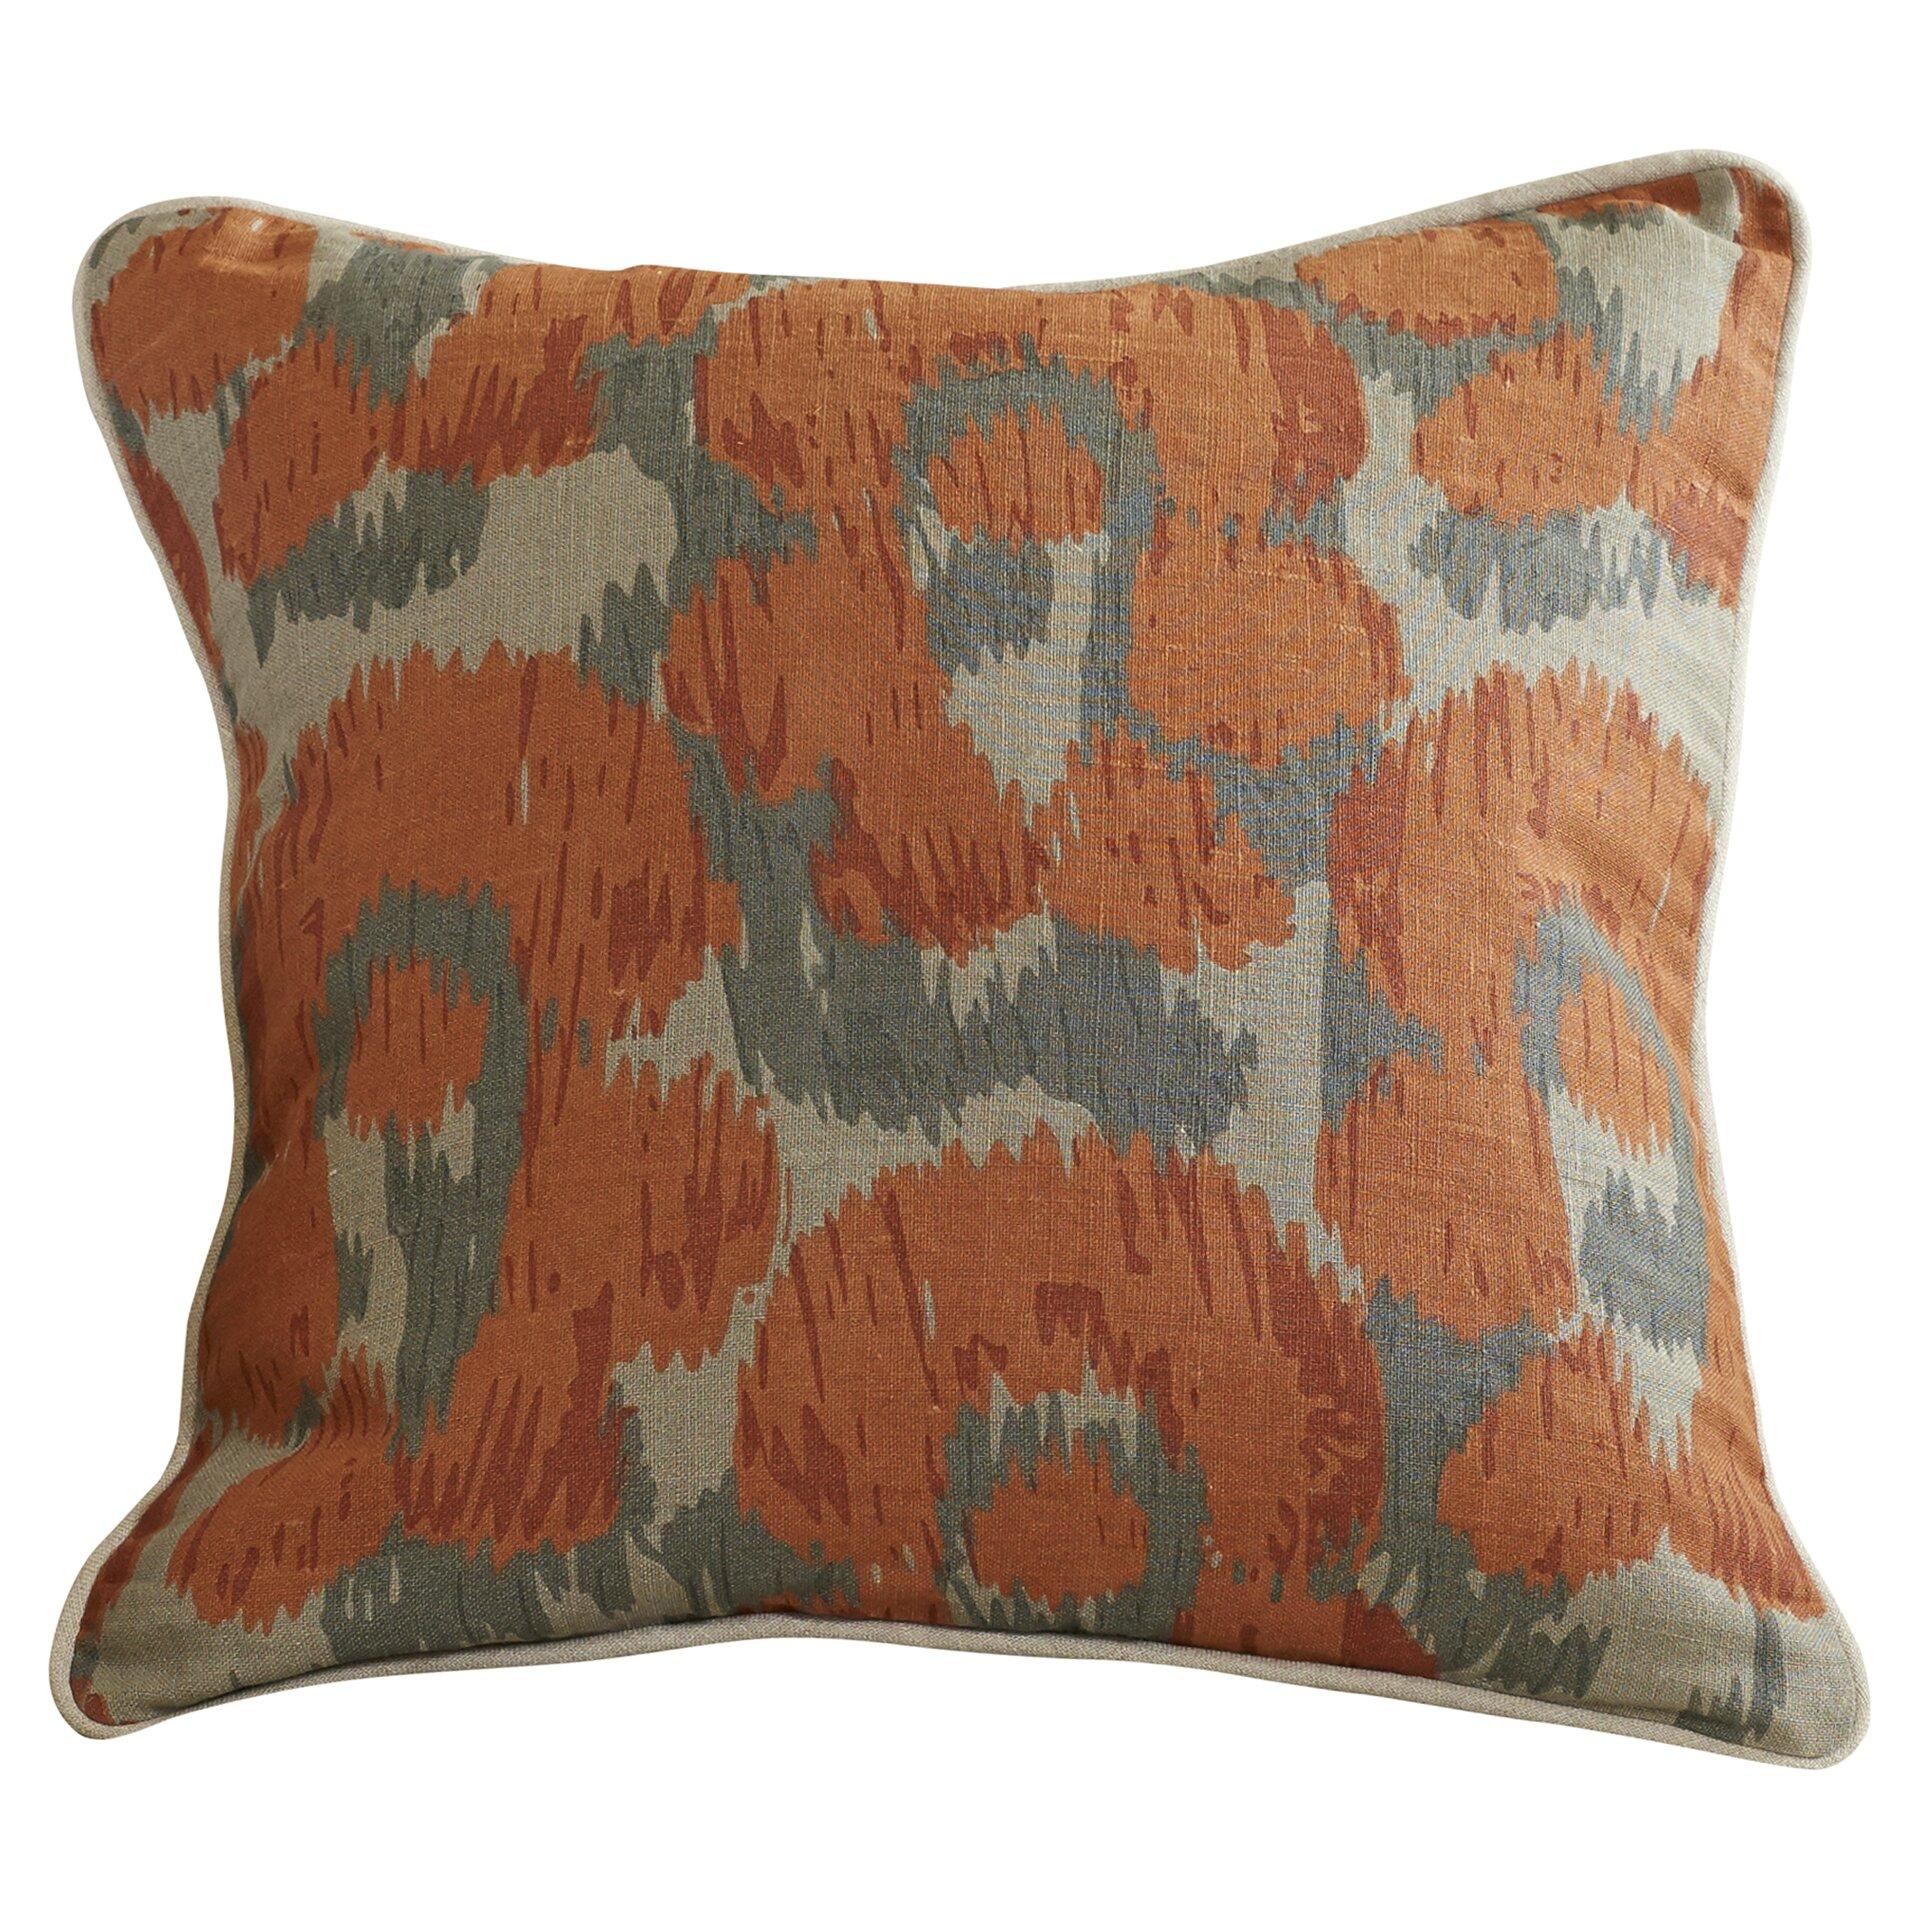 Lavender Throw Pillows : Bungalow Rose Rhiannon Jaguar Print Linen Throw Pillow & Reviews Wayfair